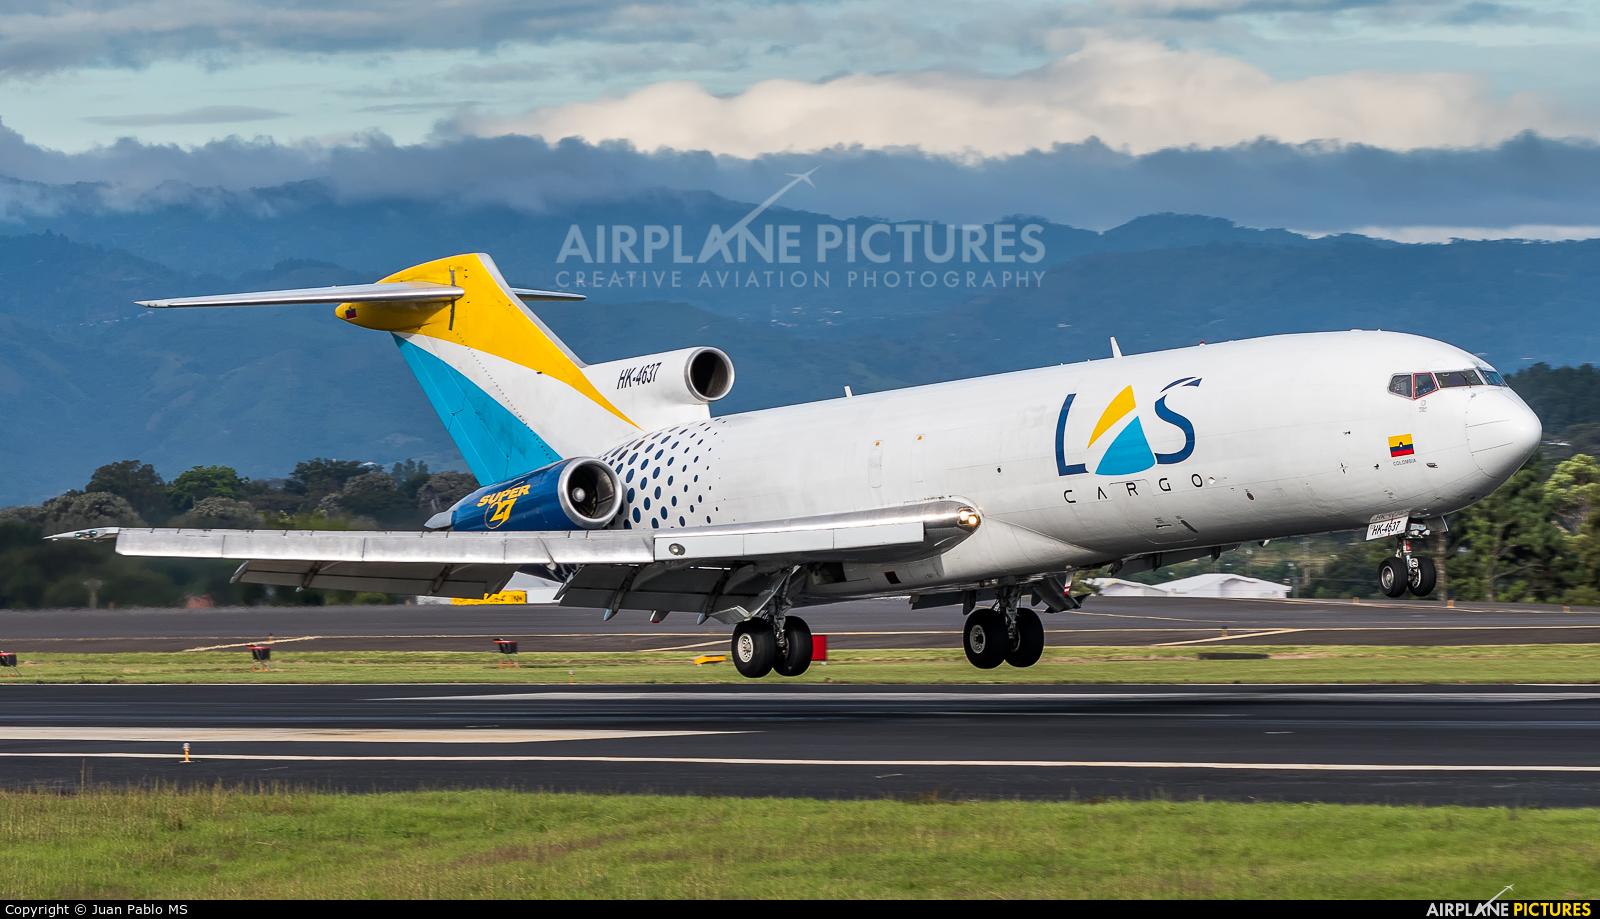 Lineas Aereas Suramericanas HK-4637 aircraft at San Jose - Juan Santamaría Intl